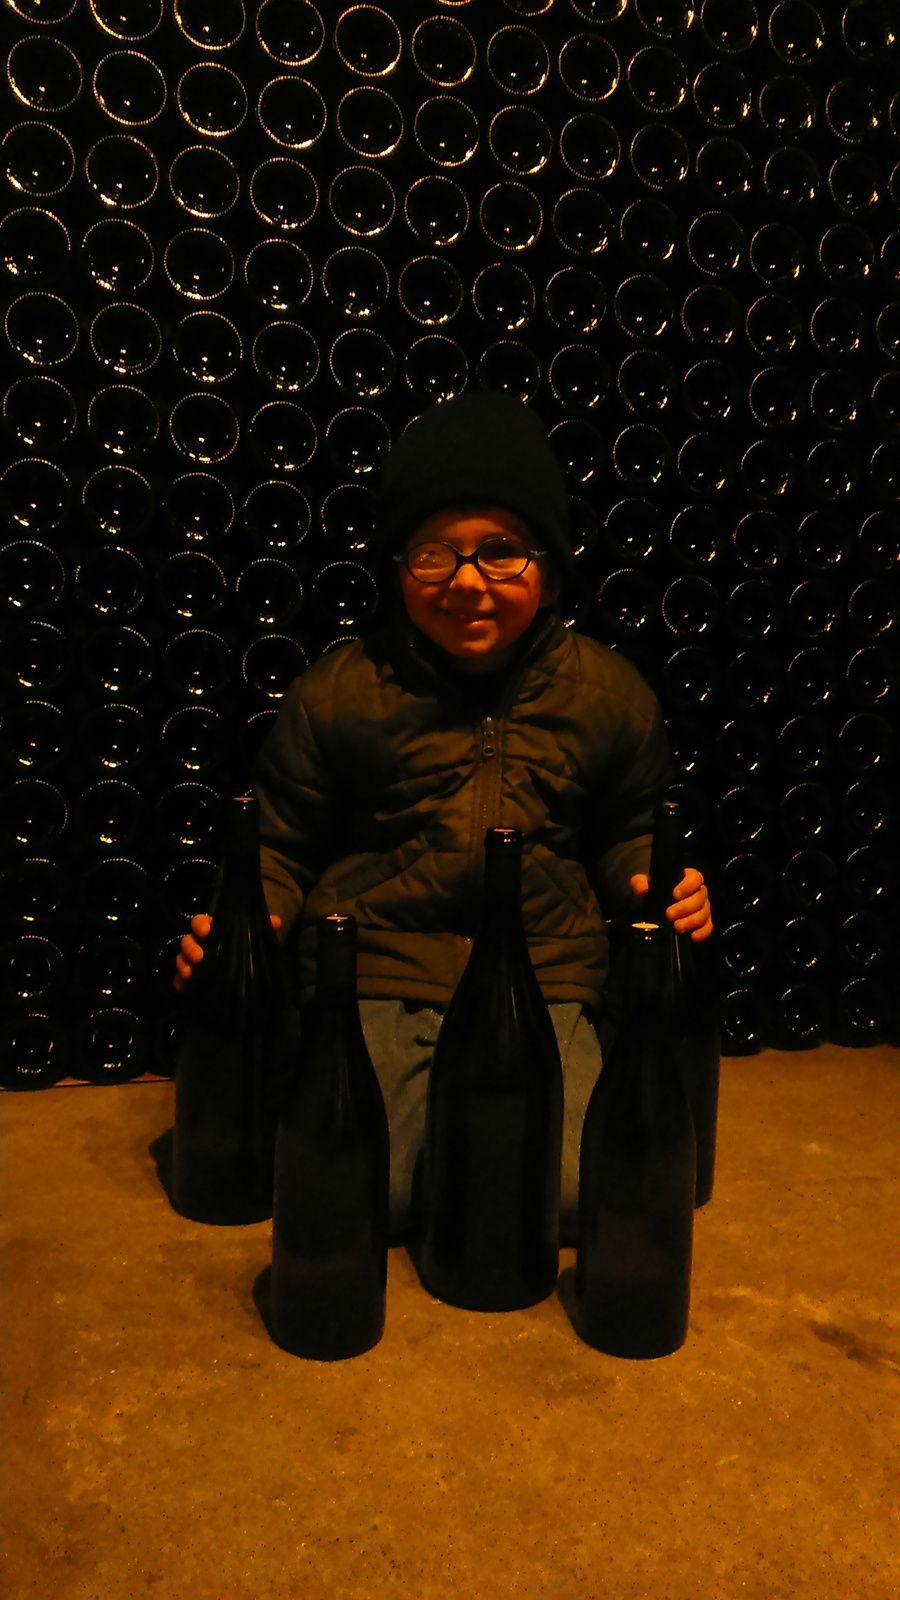 Mon fils Quentin, 6 ans